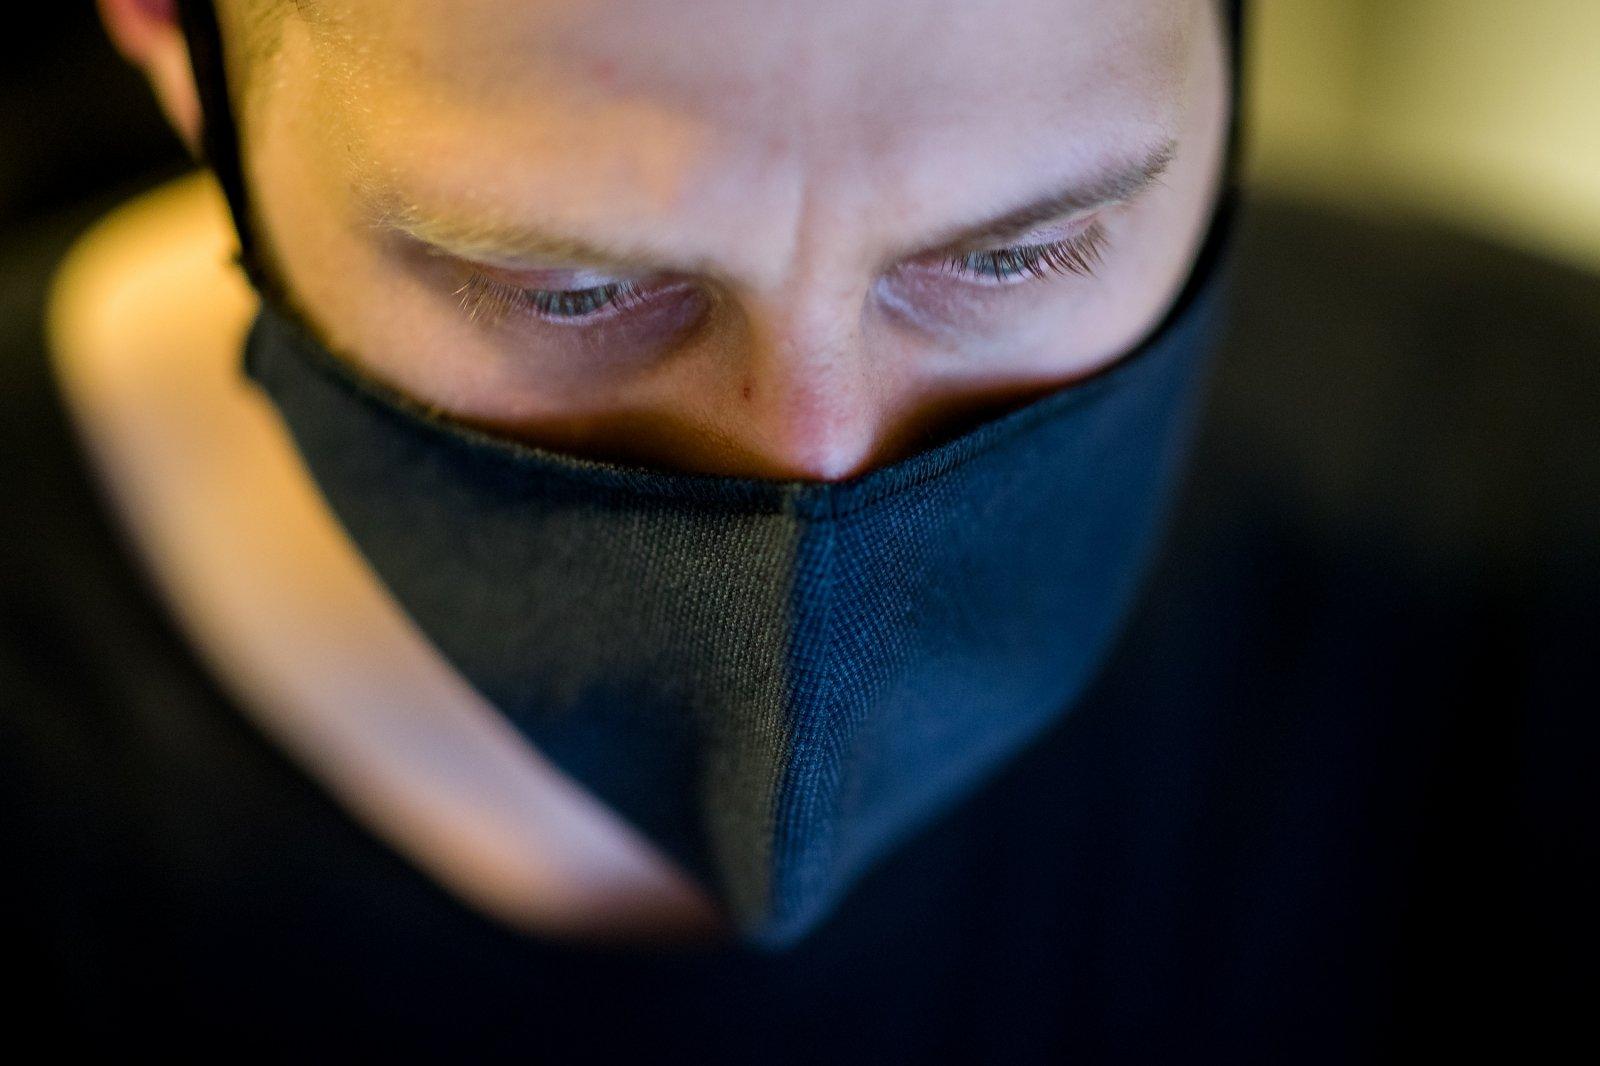 Браво охраннику: в Запорожье мужчина без маски устроил драку в супермаркете